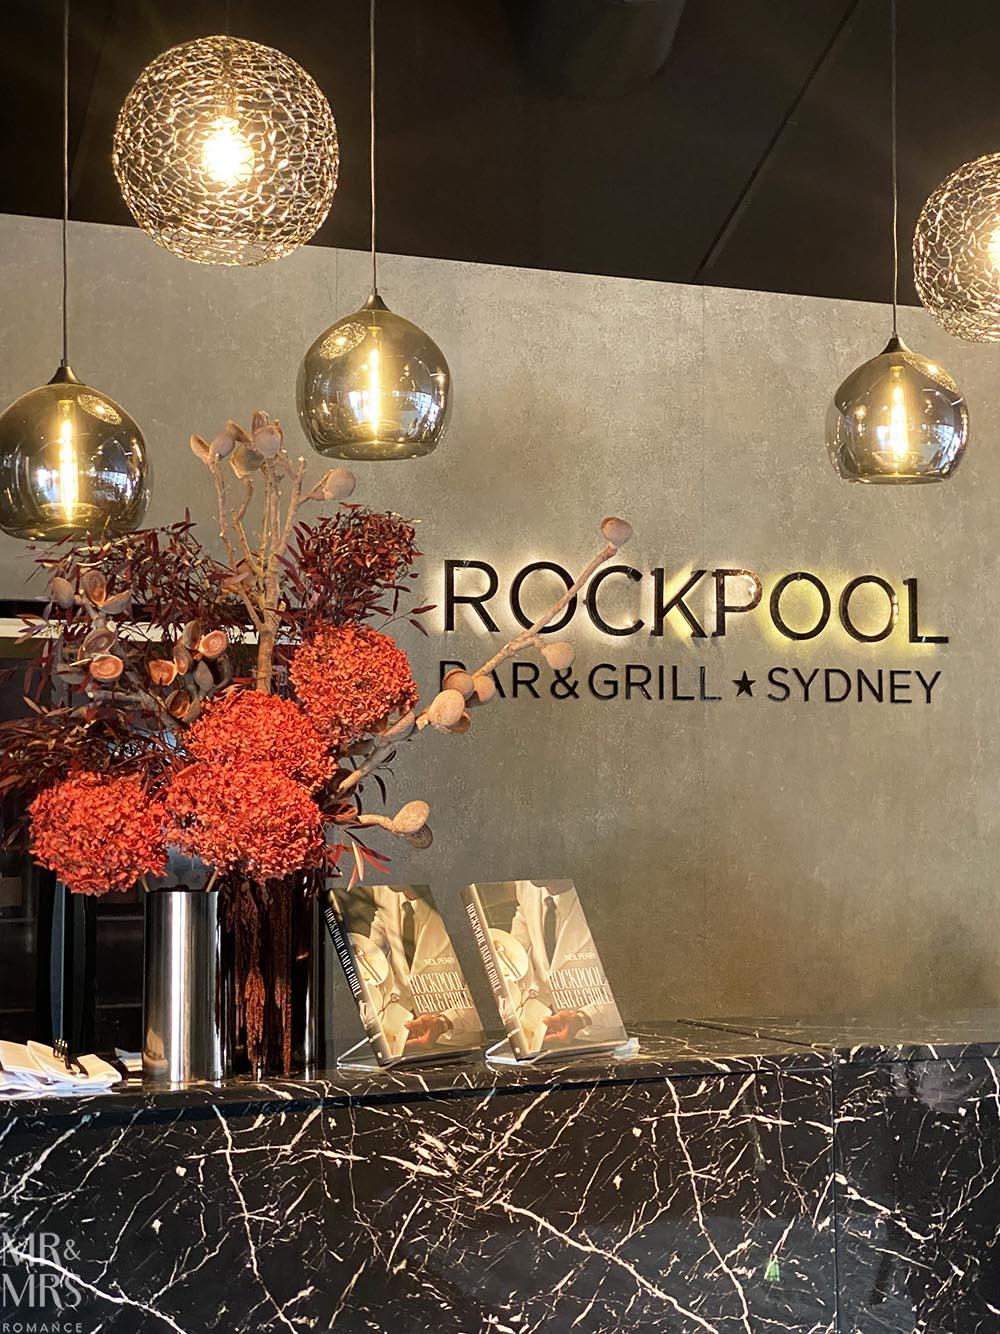 Marriott Bonvoy ATP Tennis Sydney - Rockpool